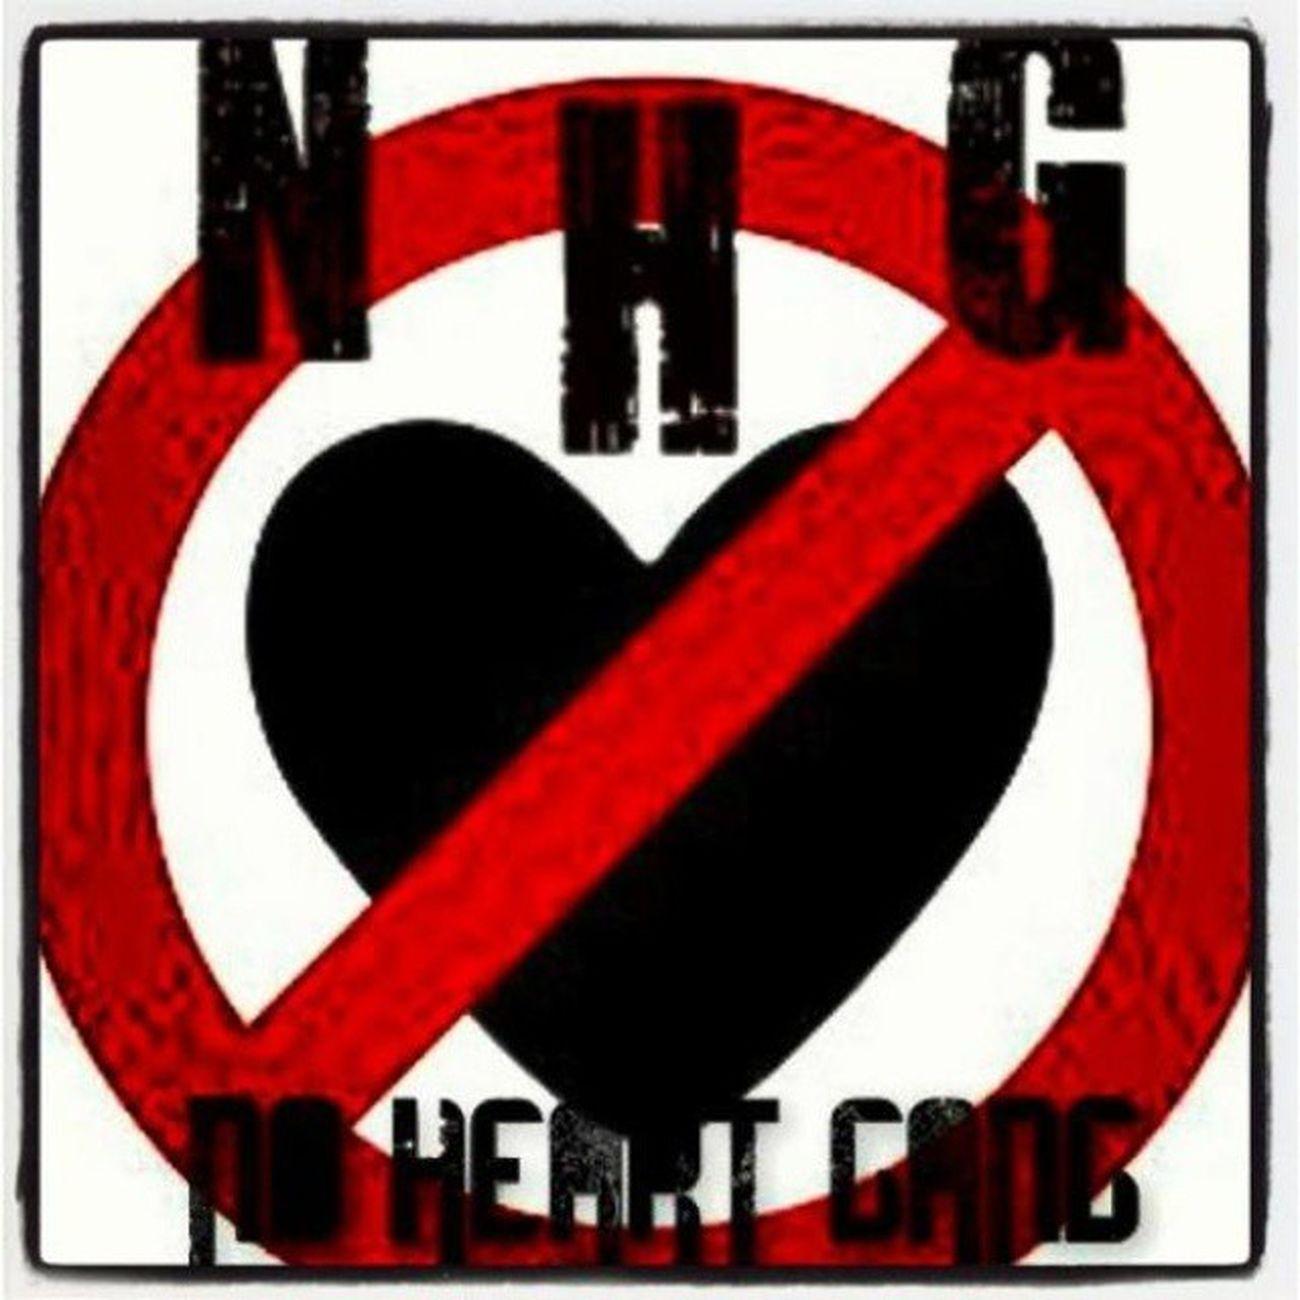 You know how I'm rockin.. NHG Fym FlightChild NoHeartGang